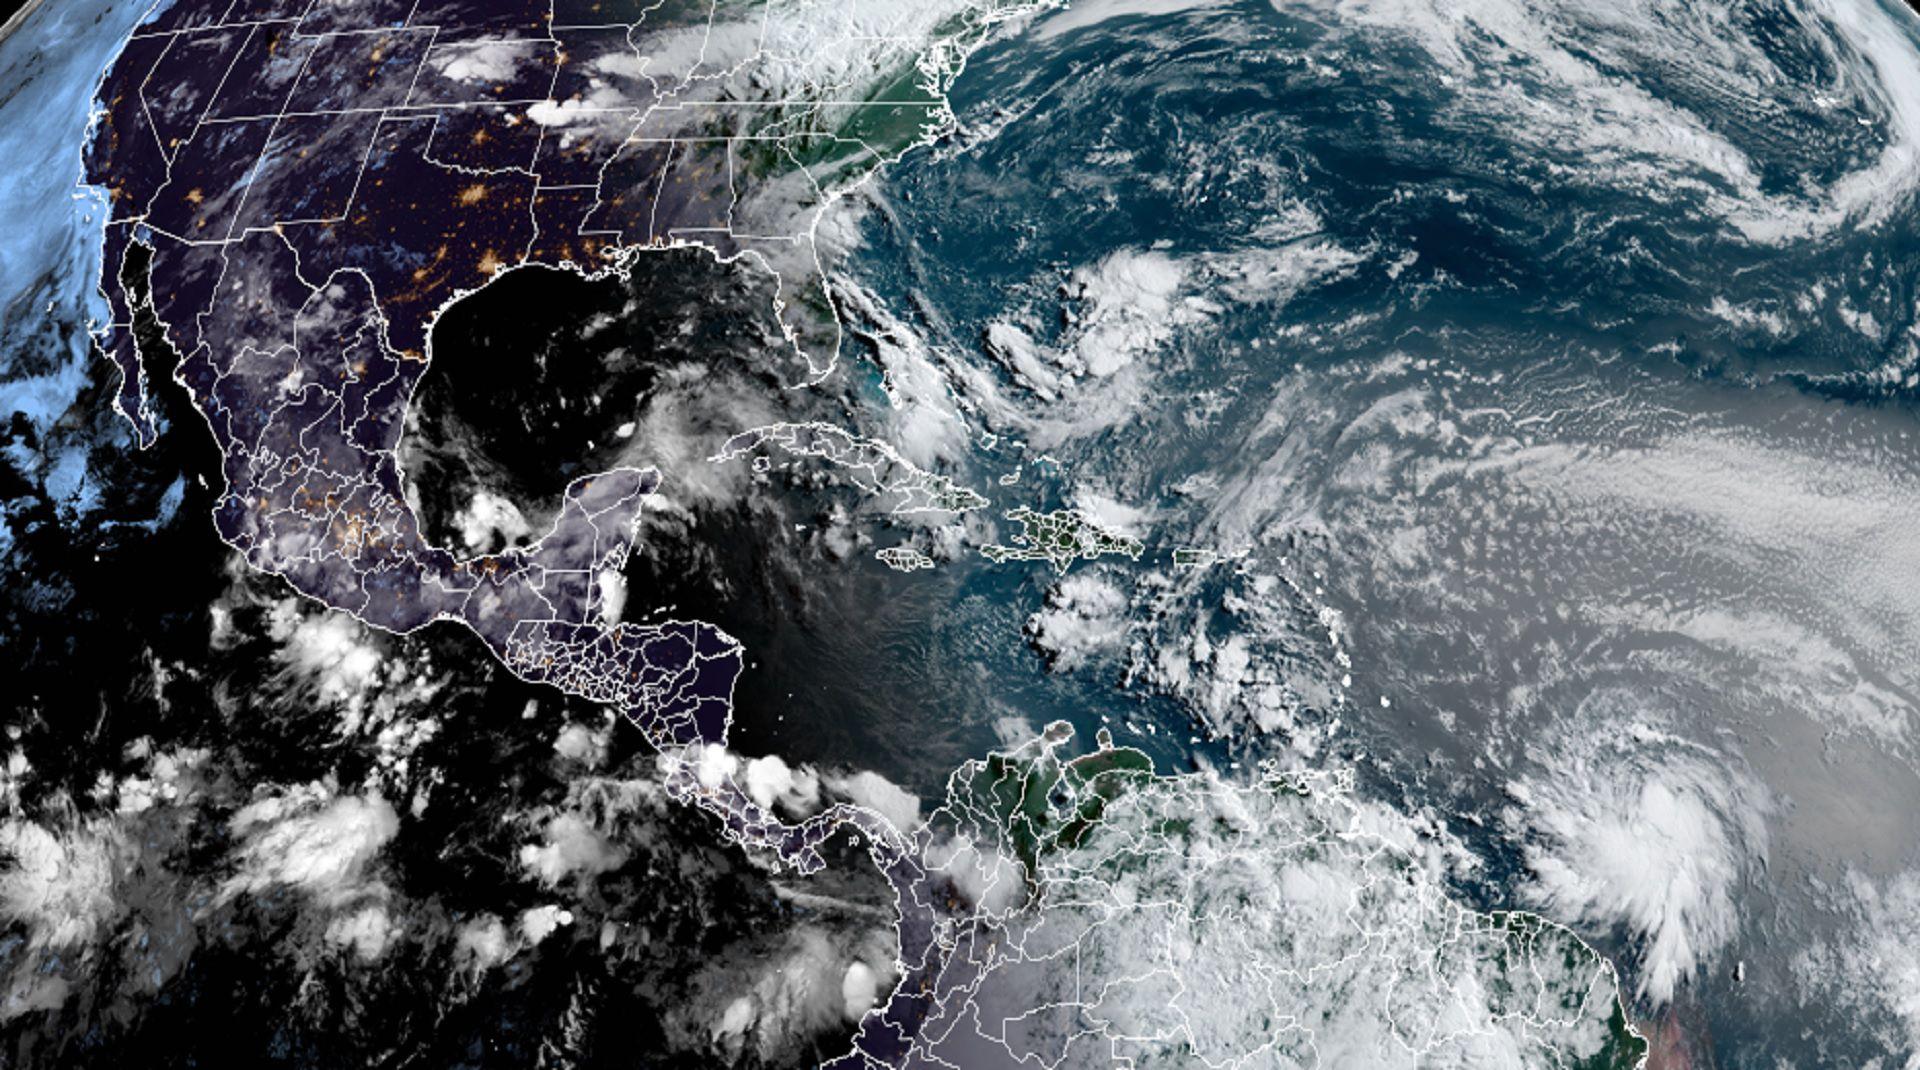 Tormenta-tropical-Elsa-Atlantico-Mexico